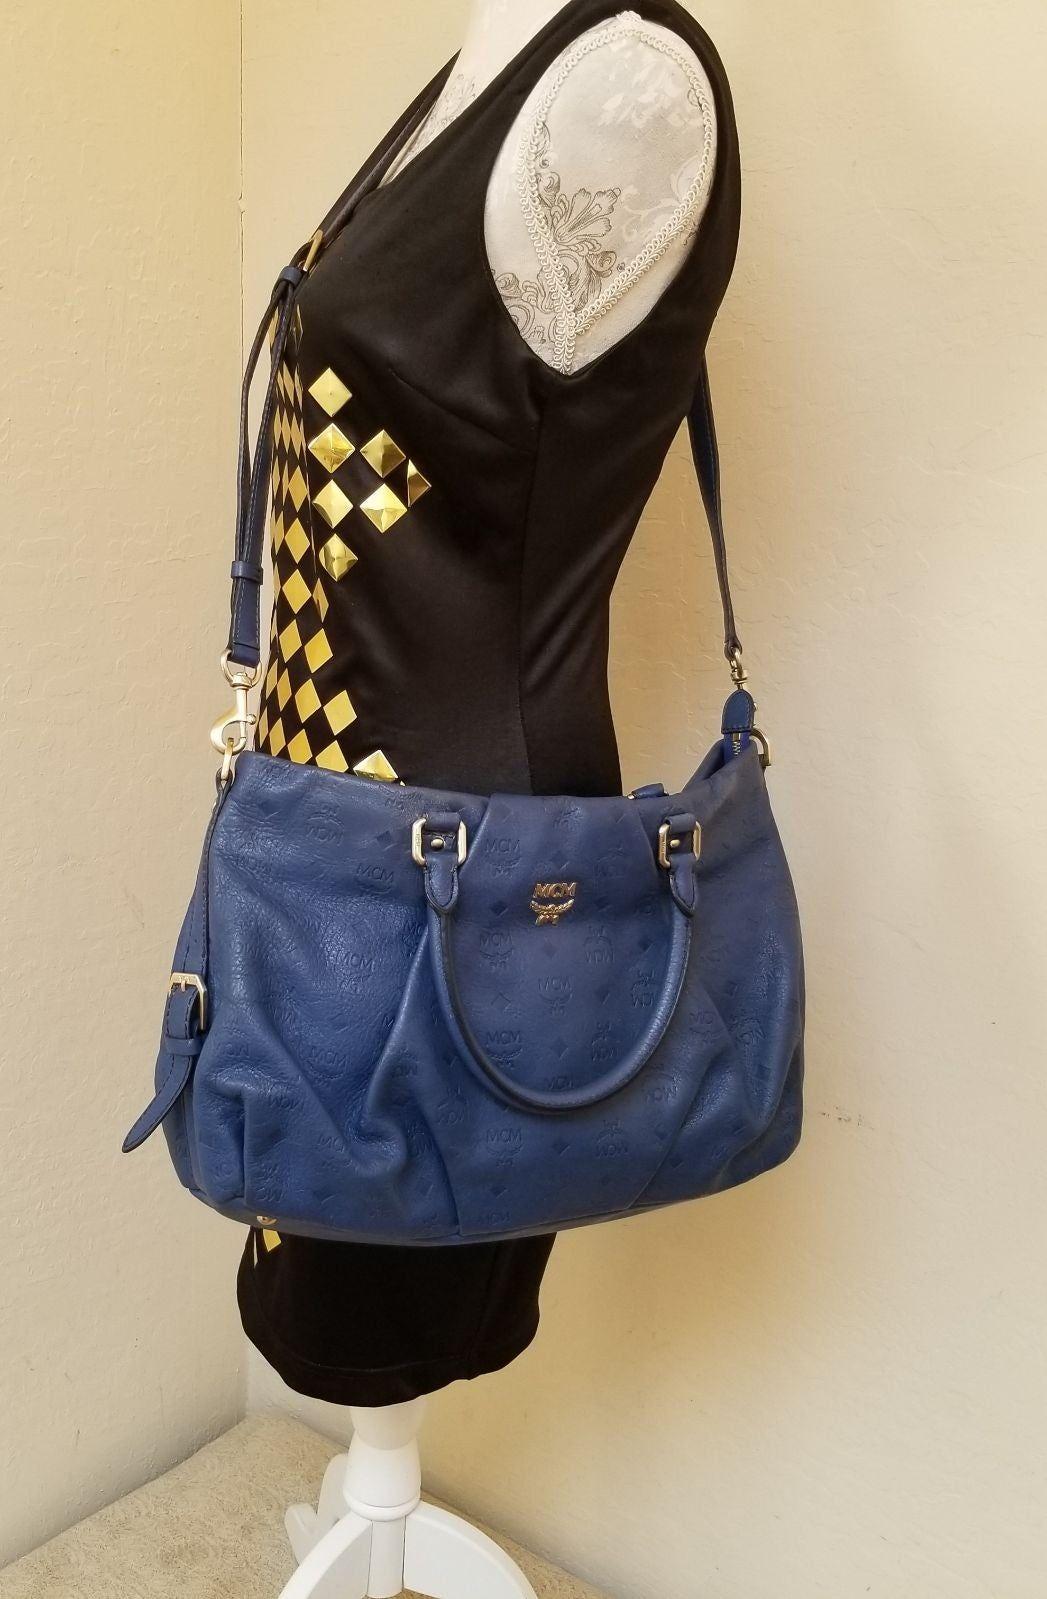 Pre Owned Authentic Mcm Shoulder Crossbody Bag Blue Monogram No